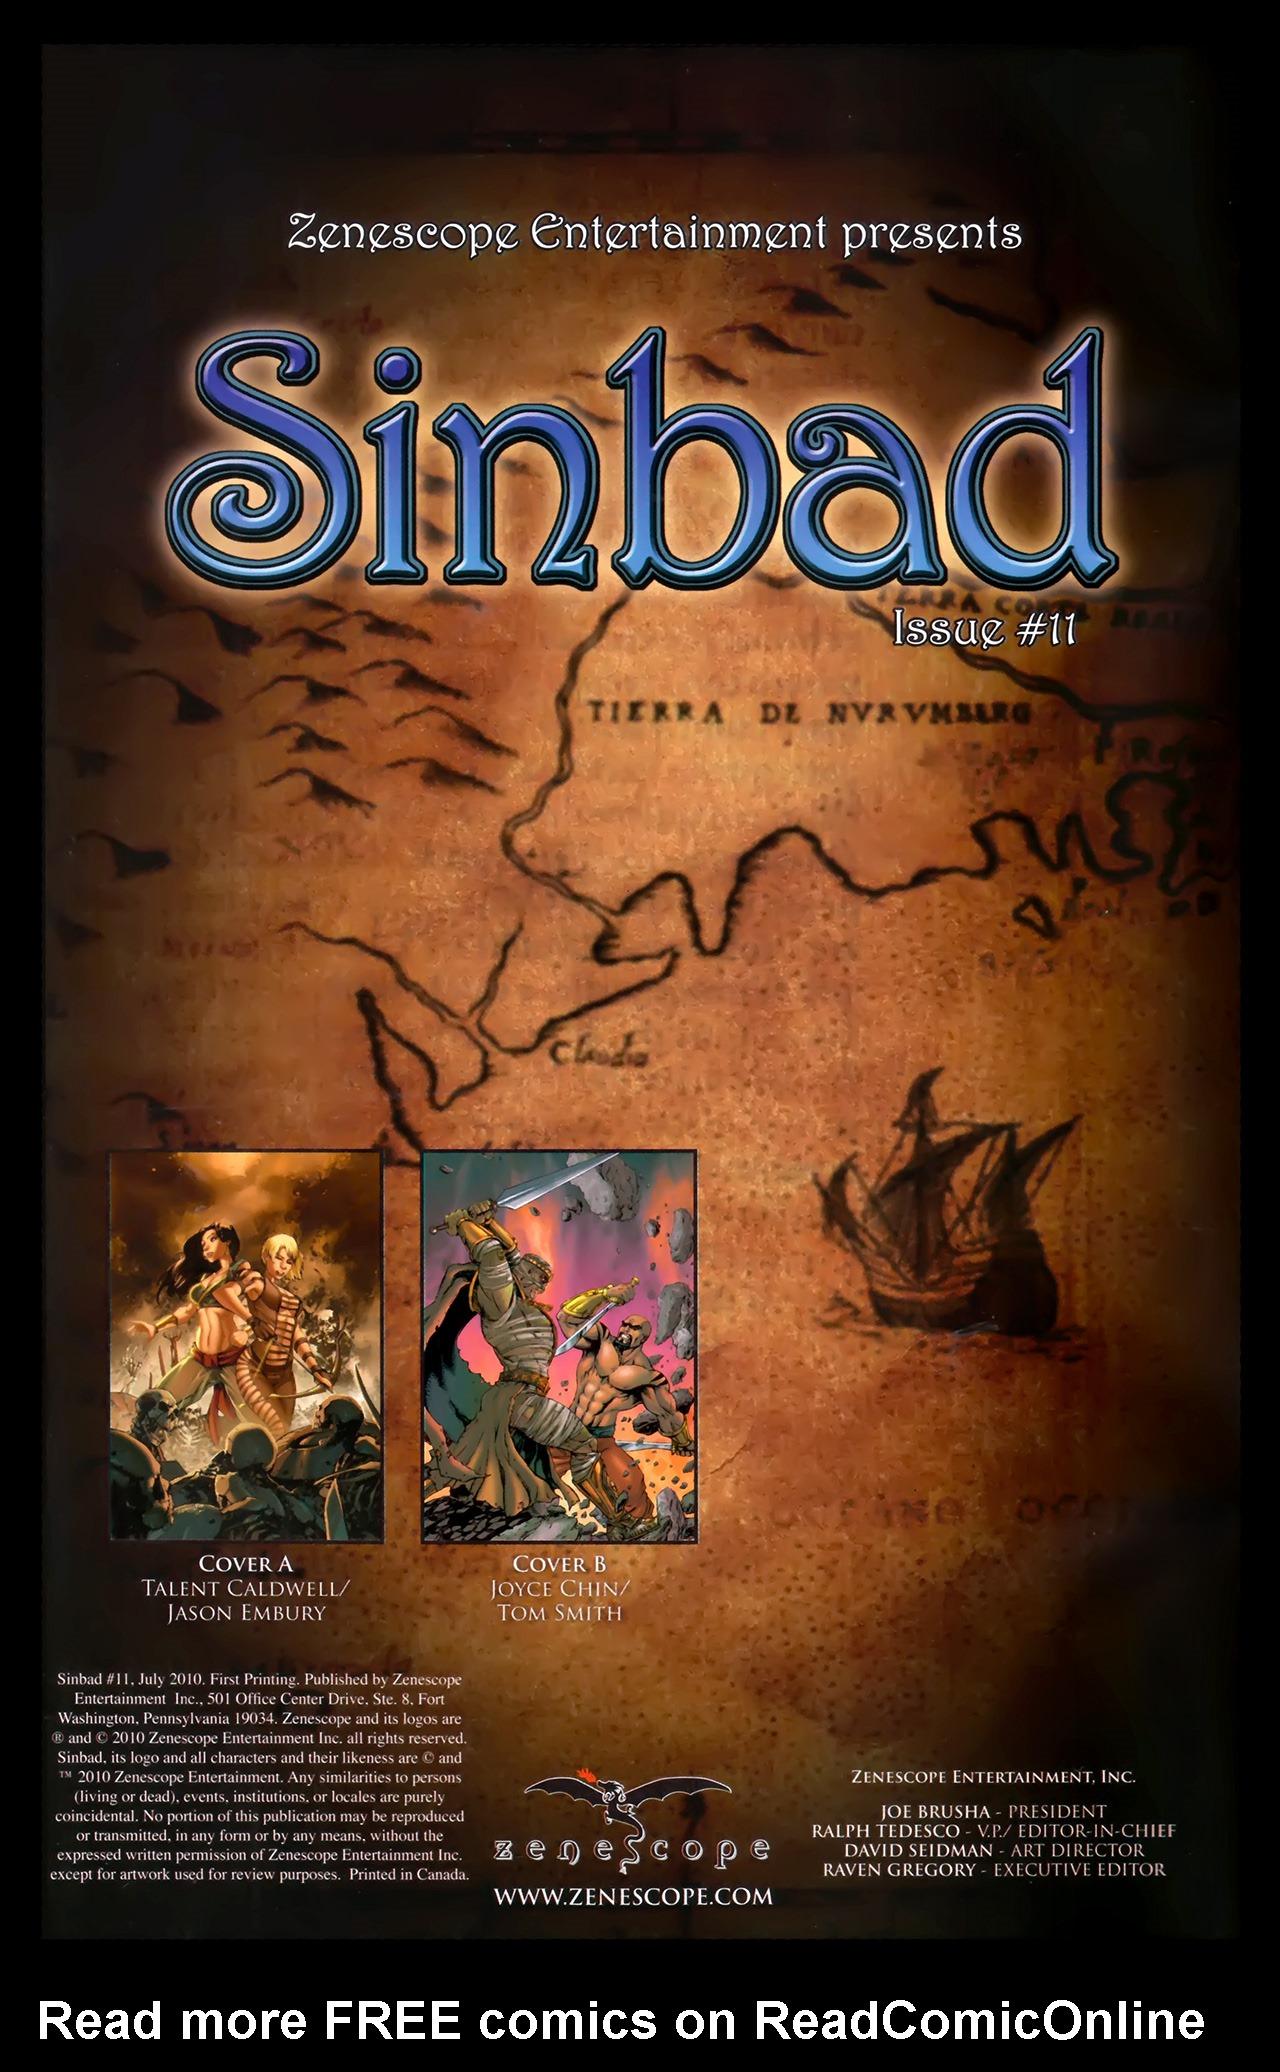 1001 Arabian Nights: The Adventures of Sinbad 11 Page 2